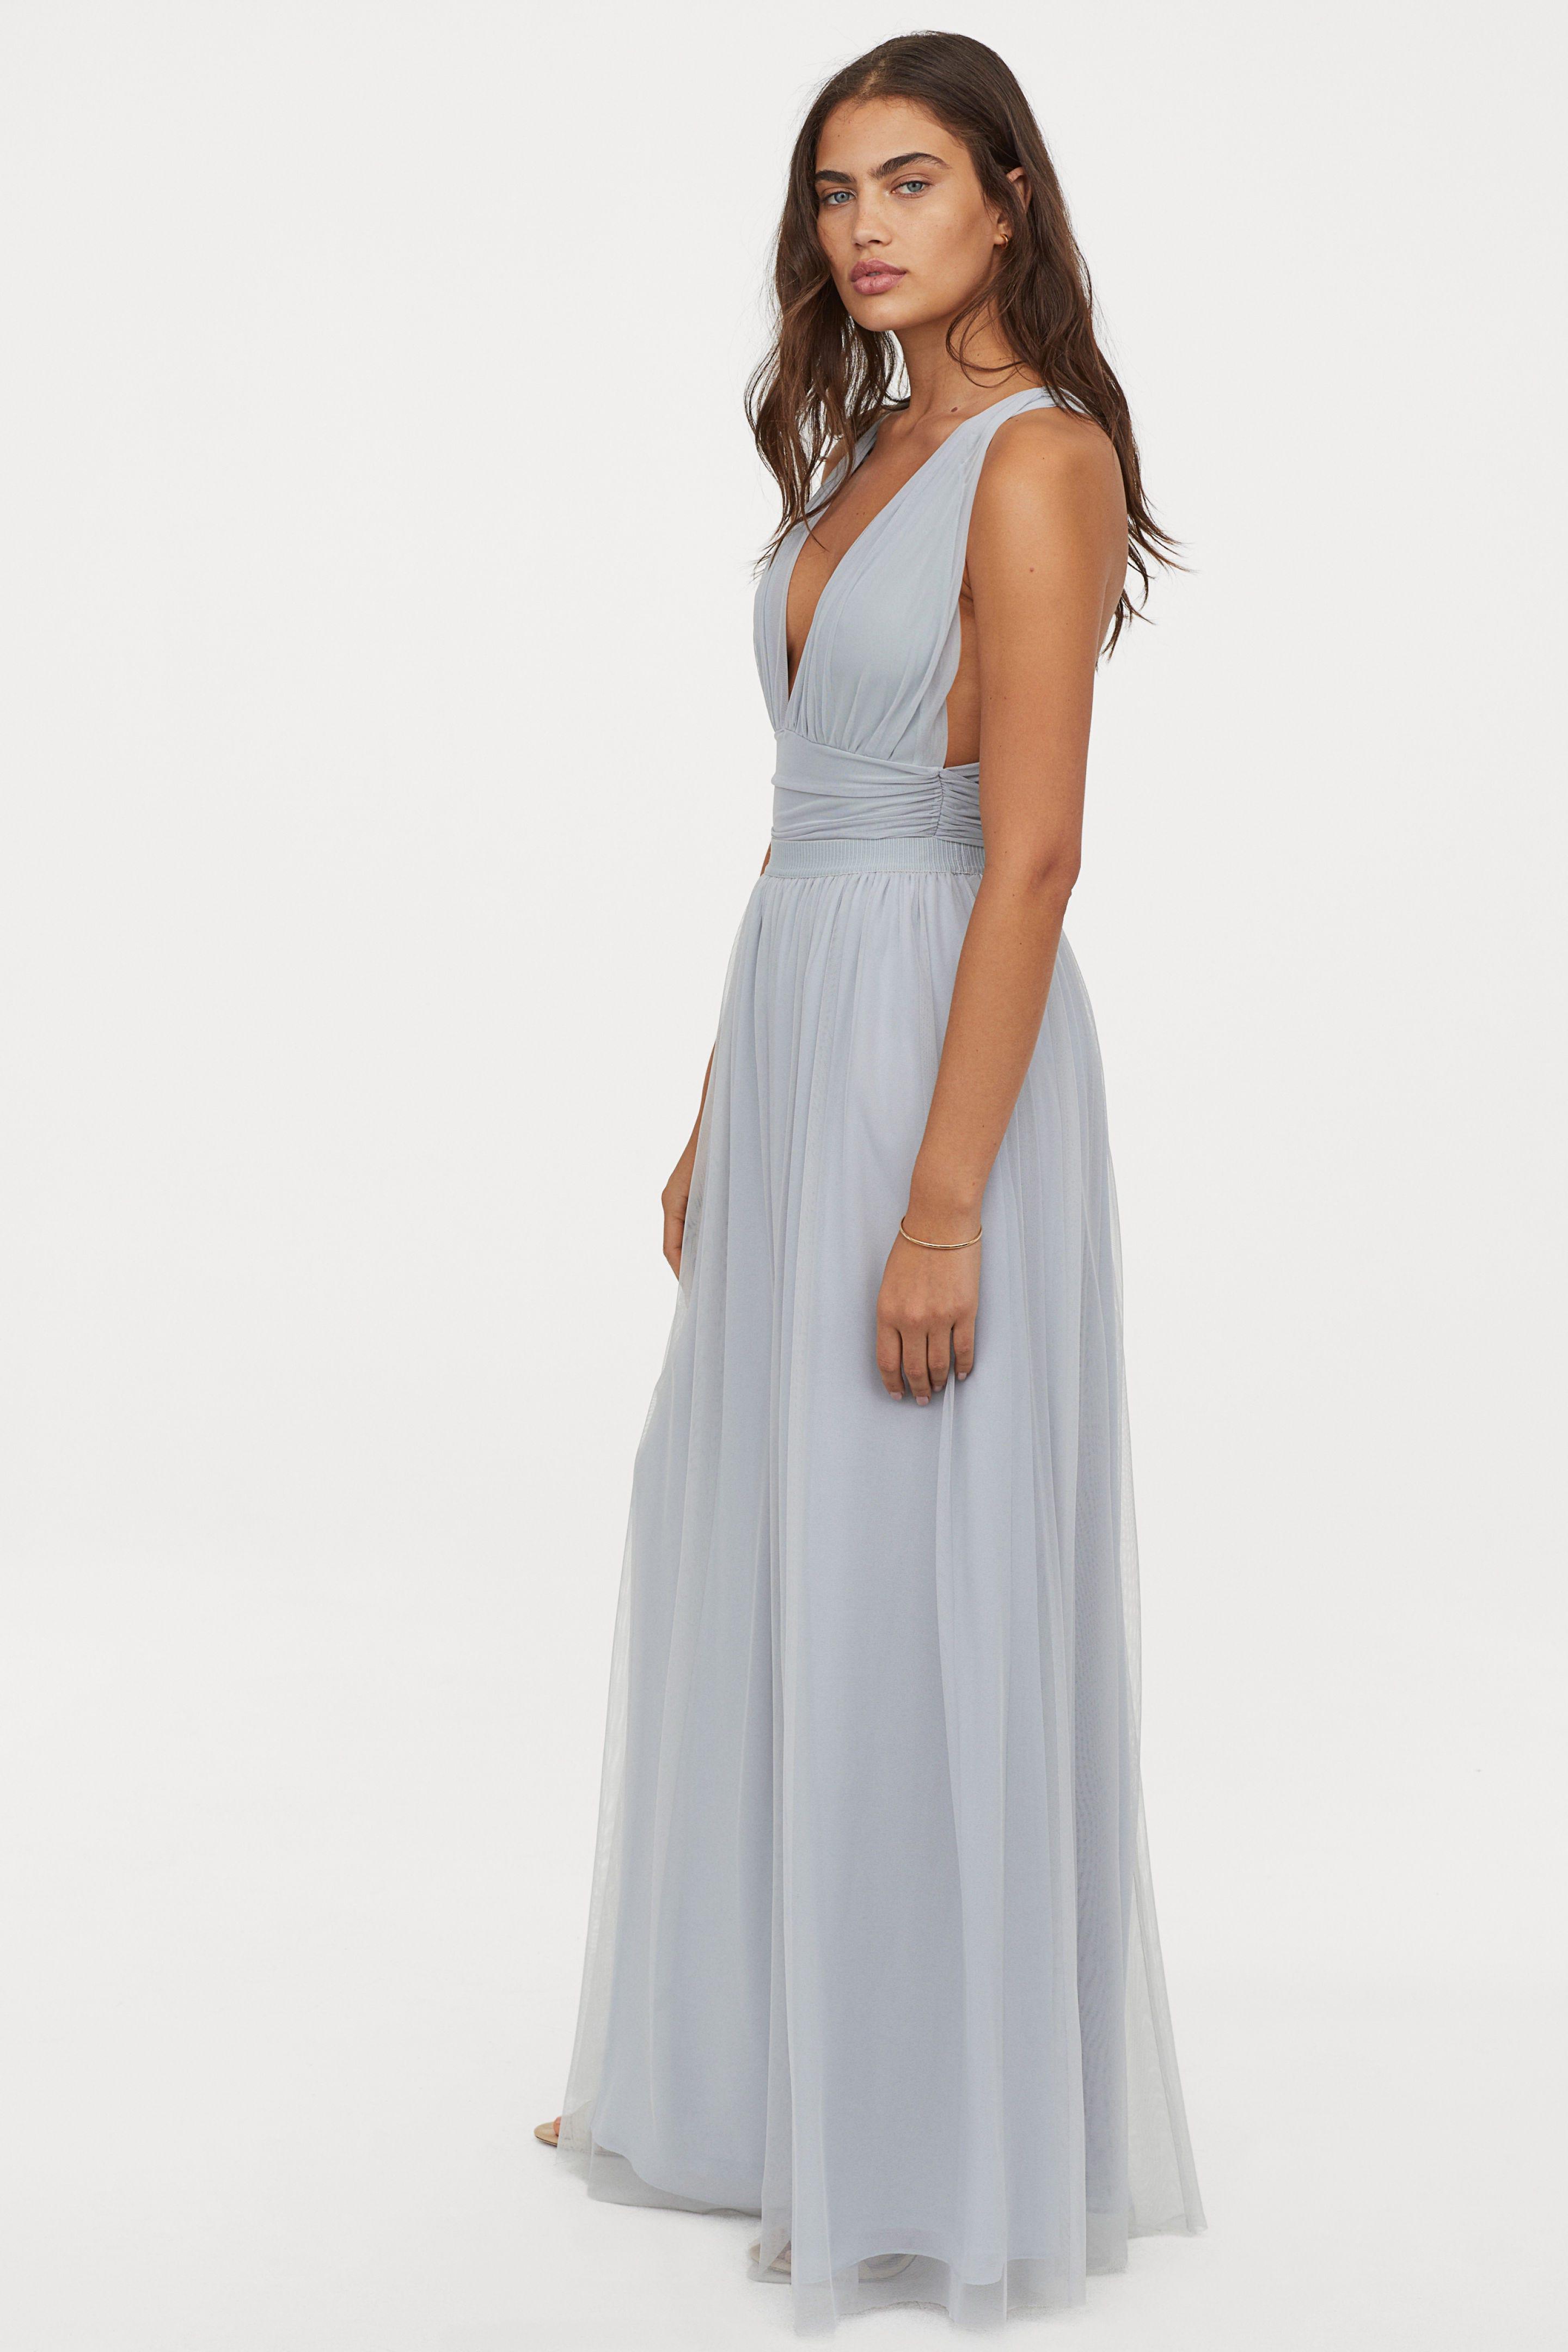 d5b0a8769297 H&M Restocked Kate Middleton Dress in 2019 Wedding Edit